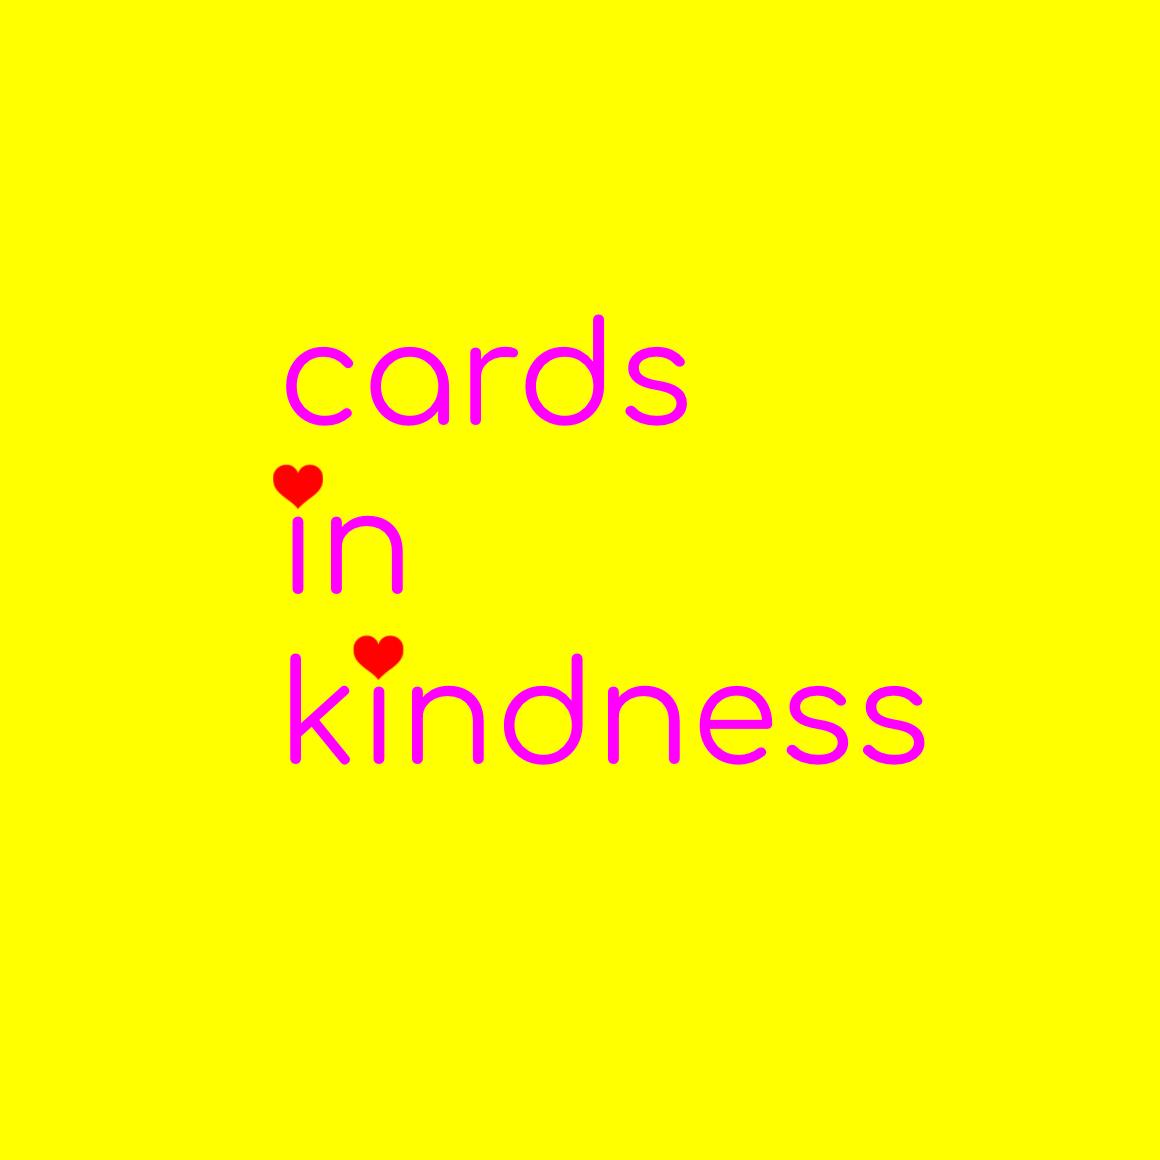 @CardsinKindnessATX Profile Image   Linktree